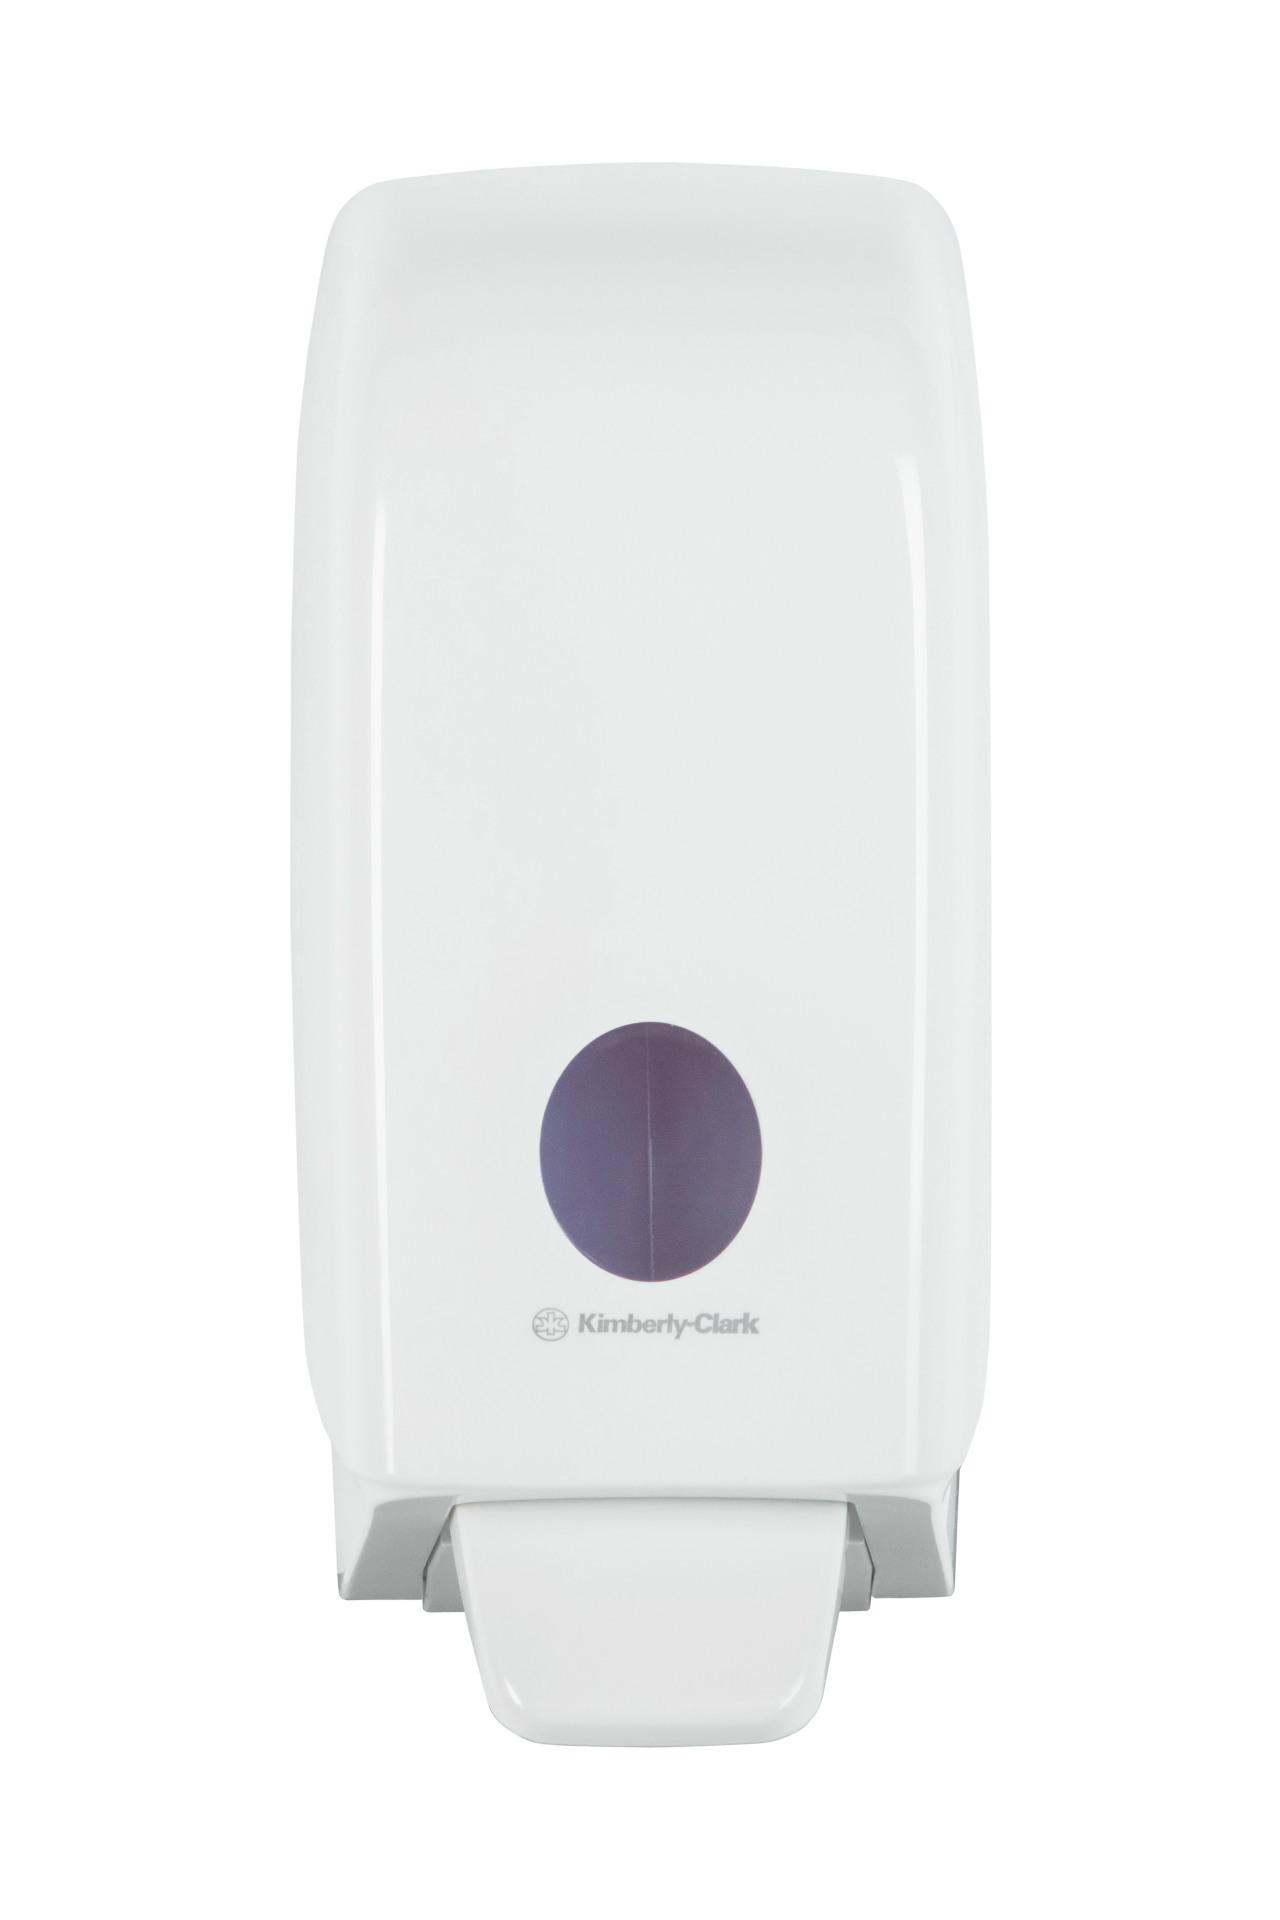 KIMBERLY-CLARK/金佰利 69480(原92144) 泡沫型洗手液分配器